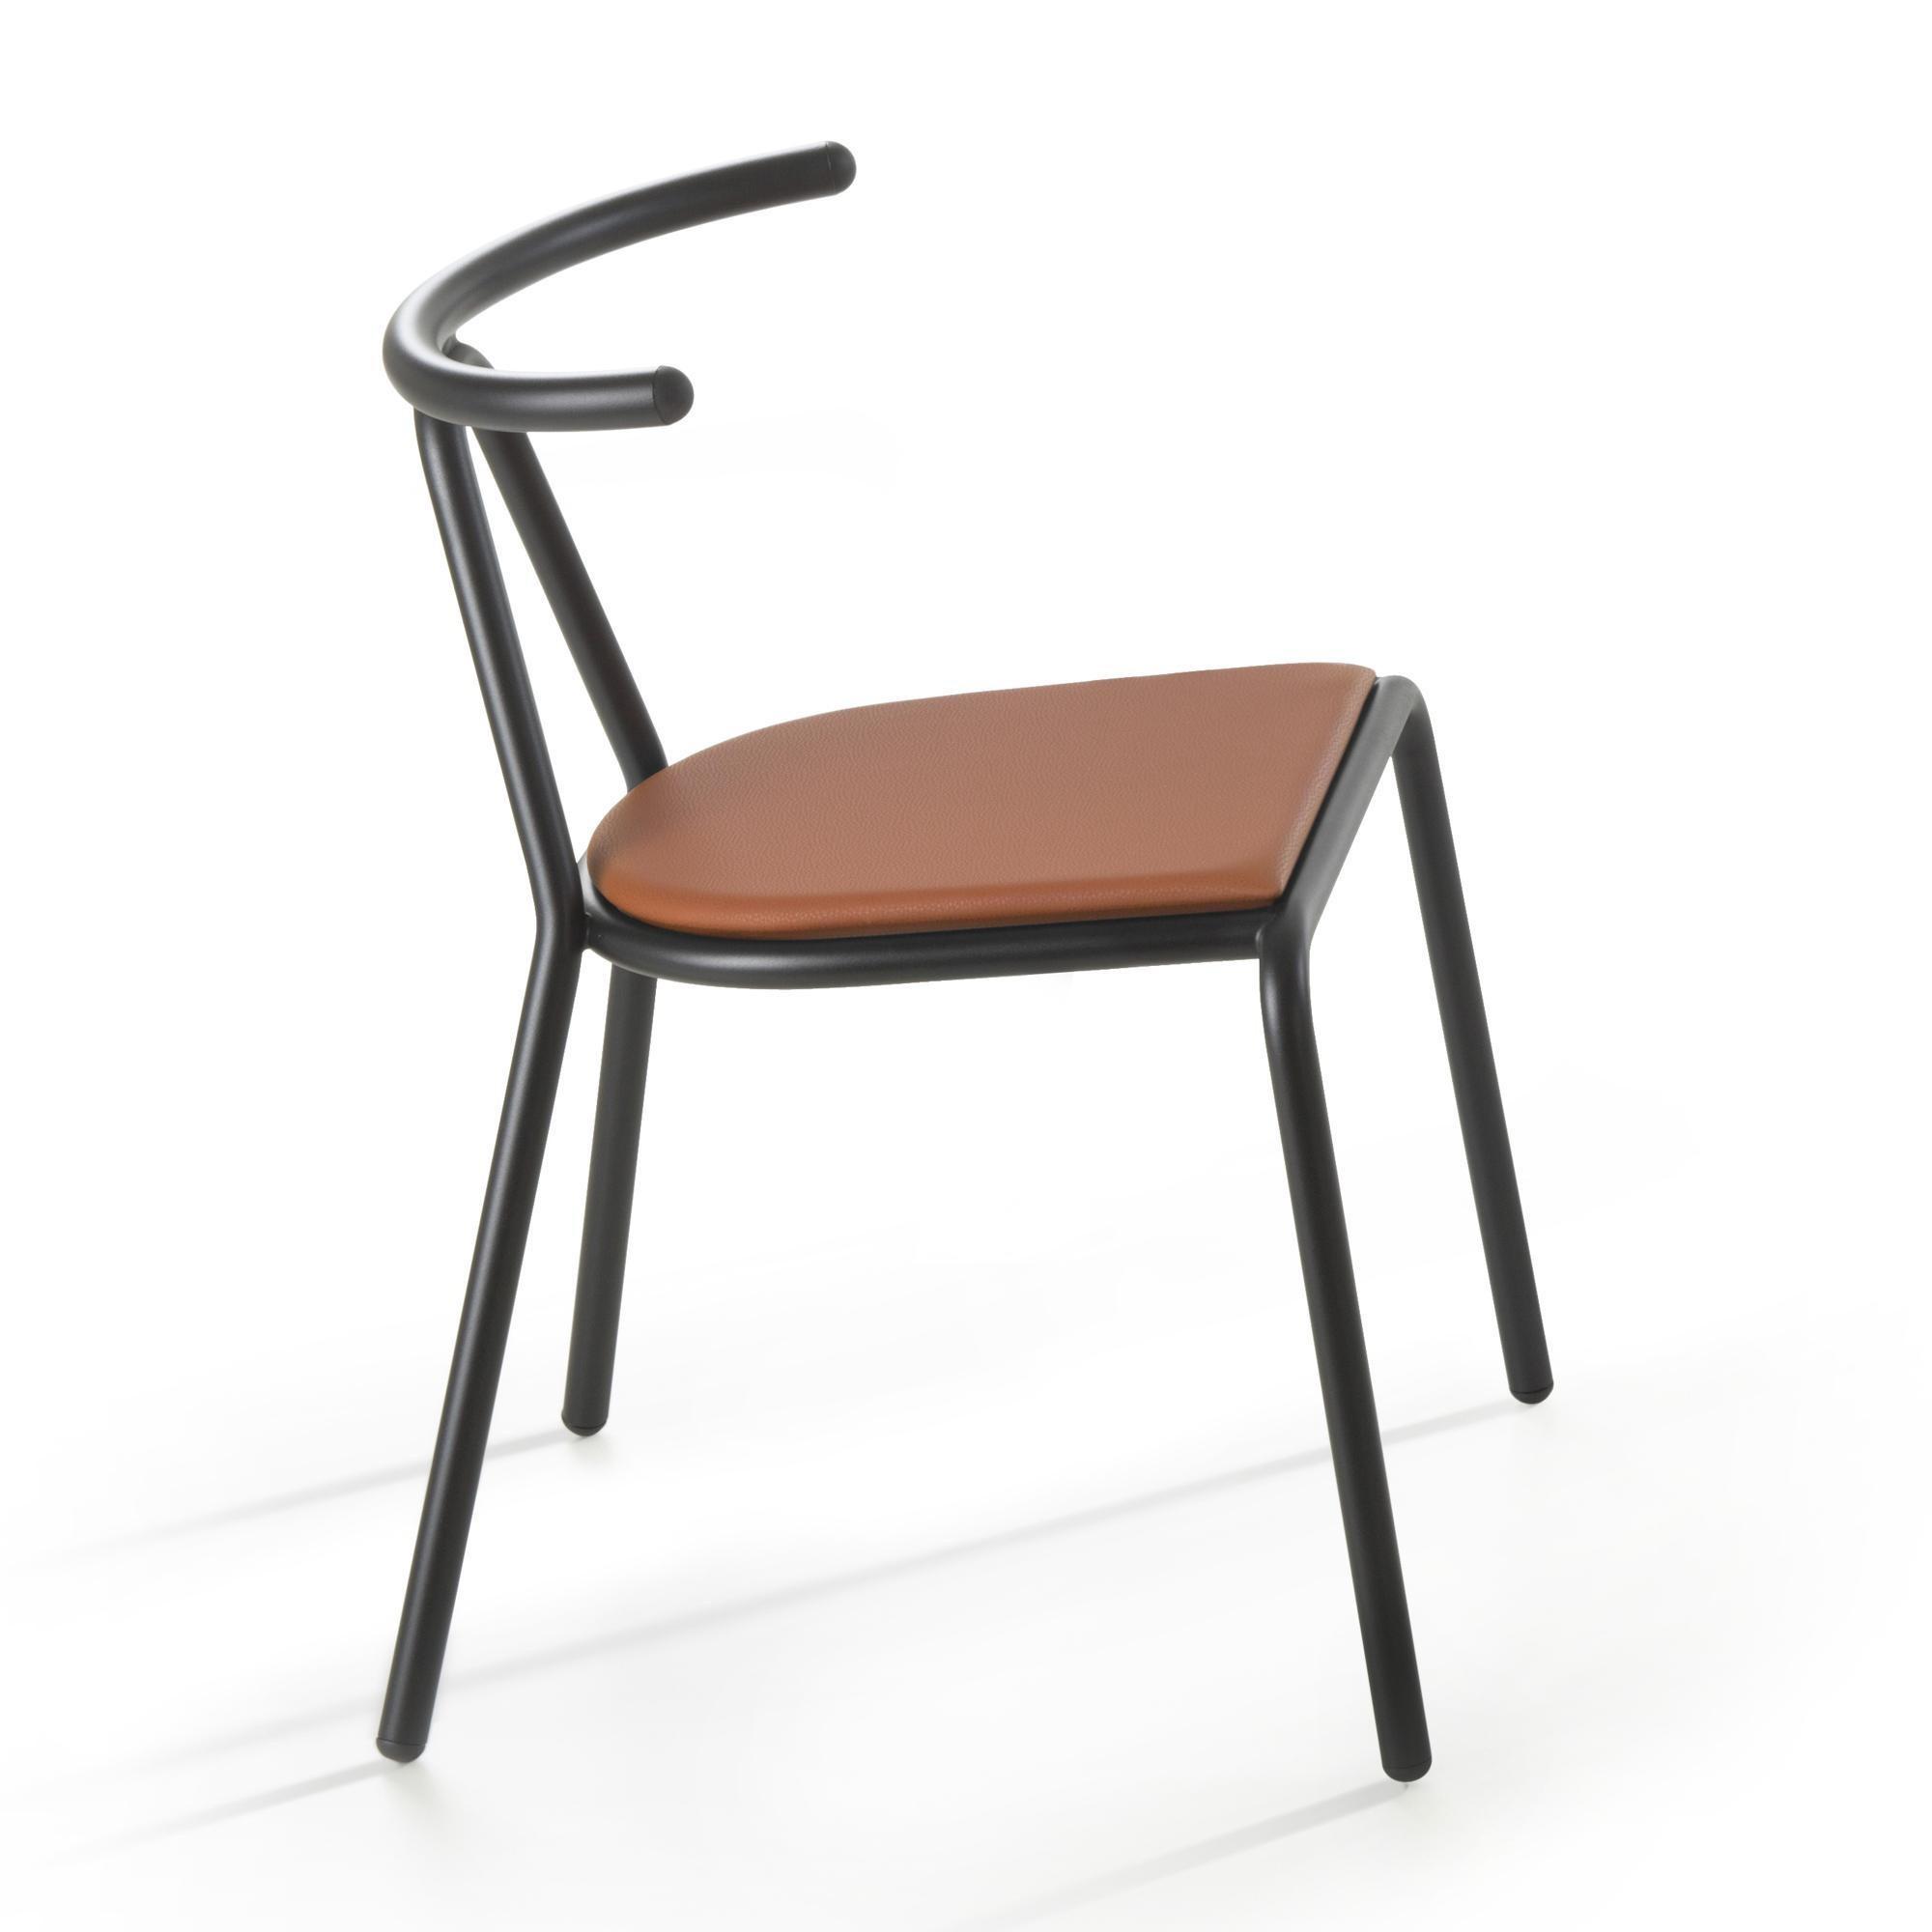 B-Line - Toro Chair seat Platinum Flukso - orange/seat: Platinum Flukso